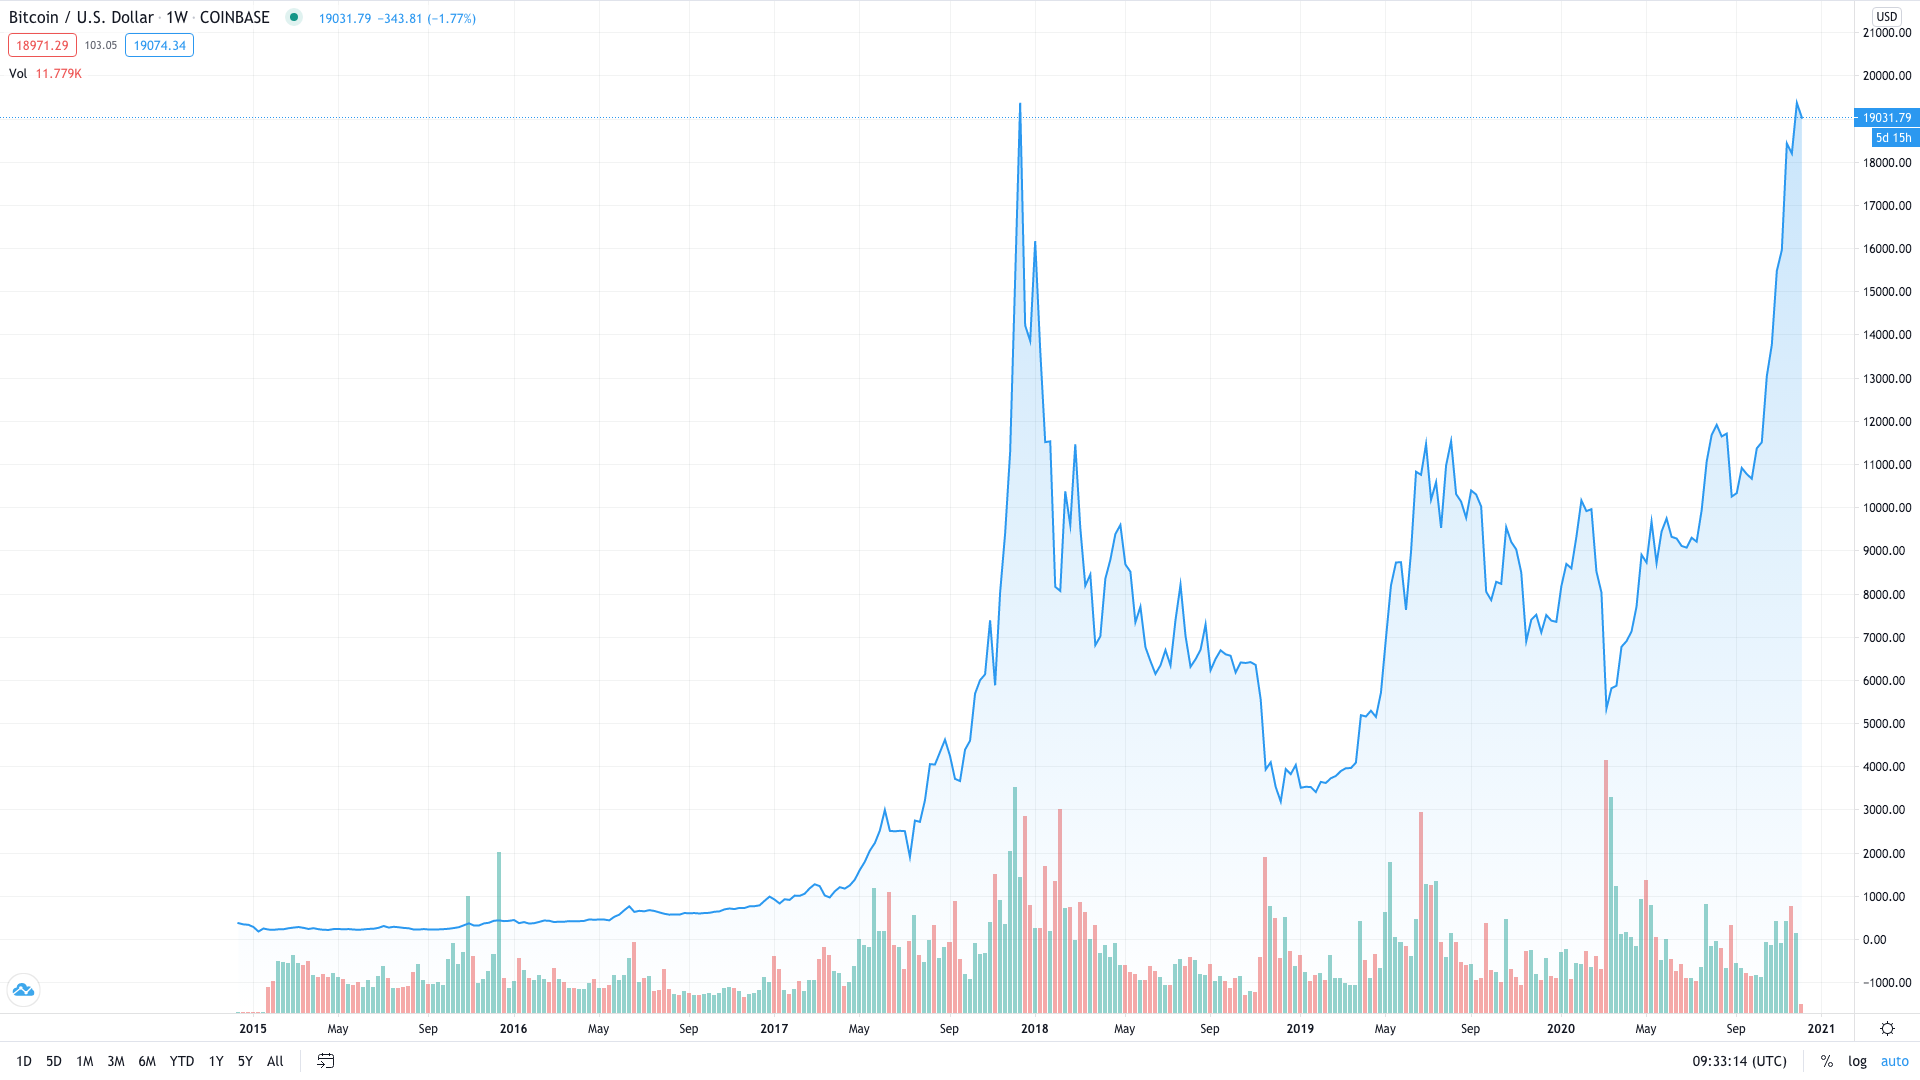 Bitcoin's Price Action